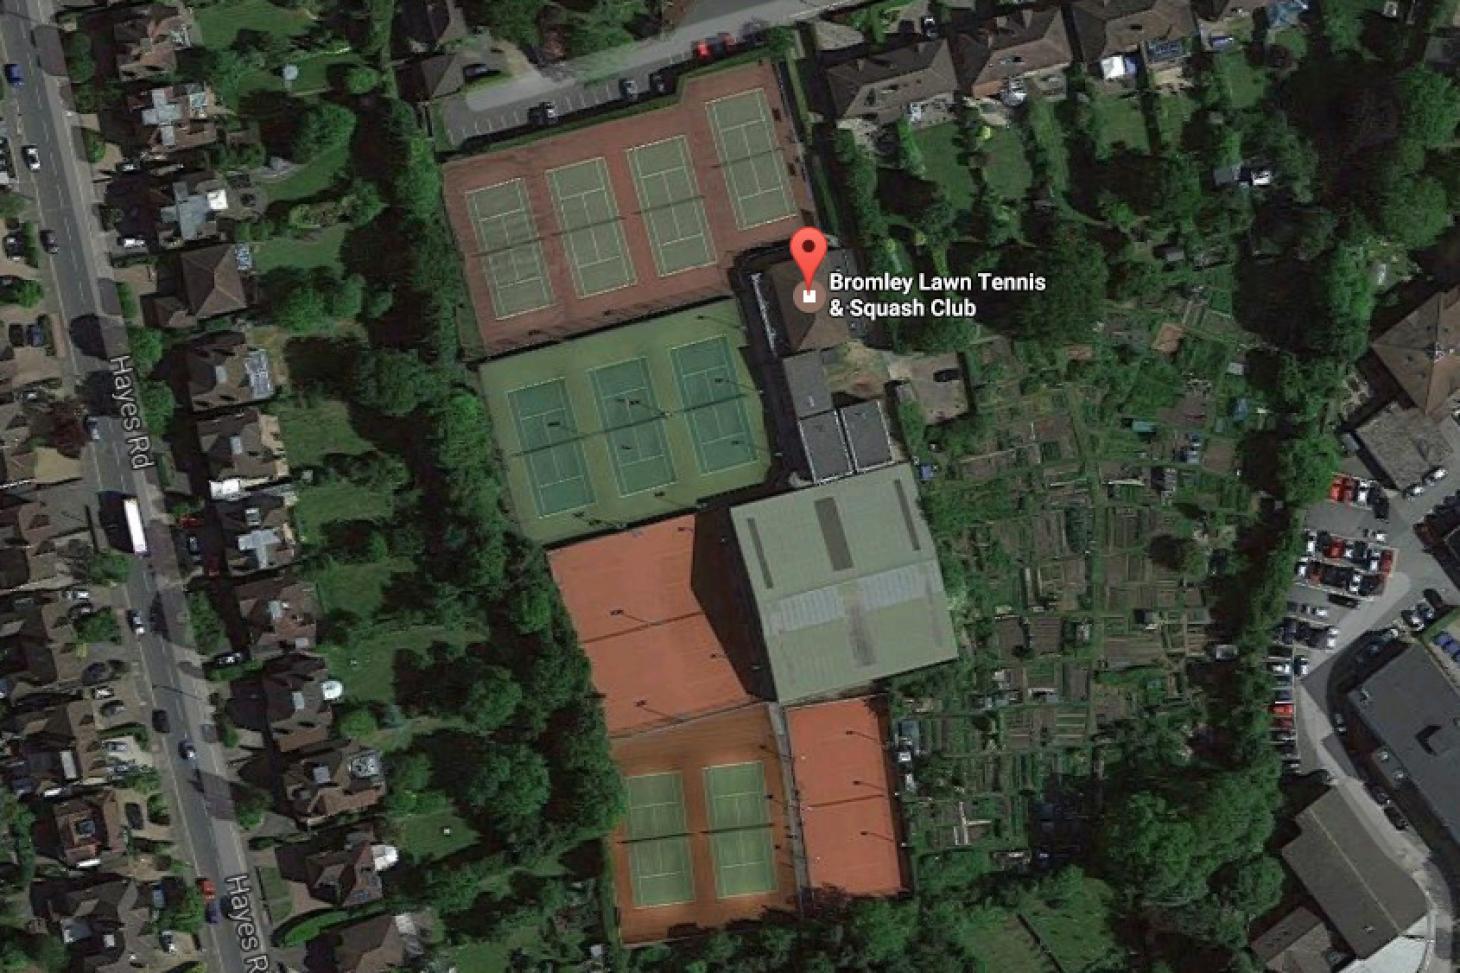 Bromley Lawn Tennis and Squash Club Outdoor   Hard (macadam) tennis court